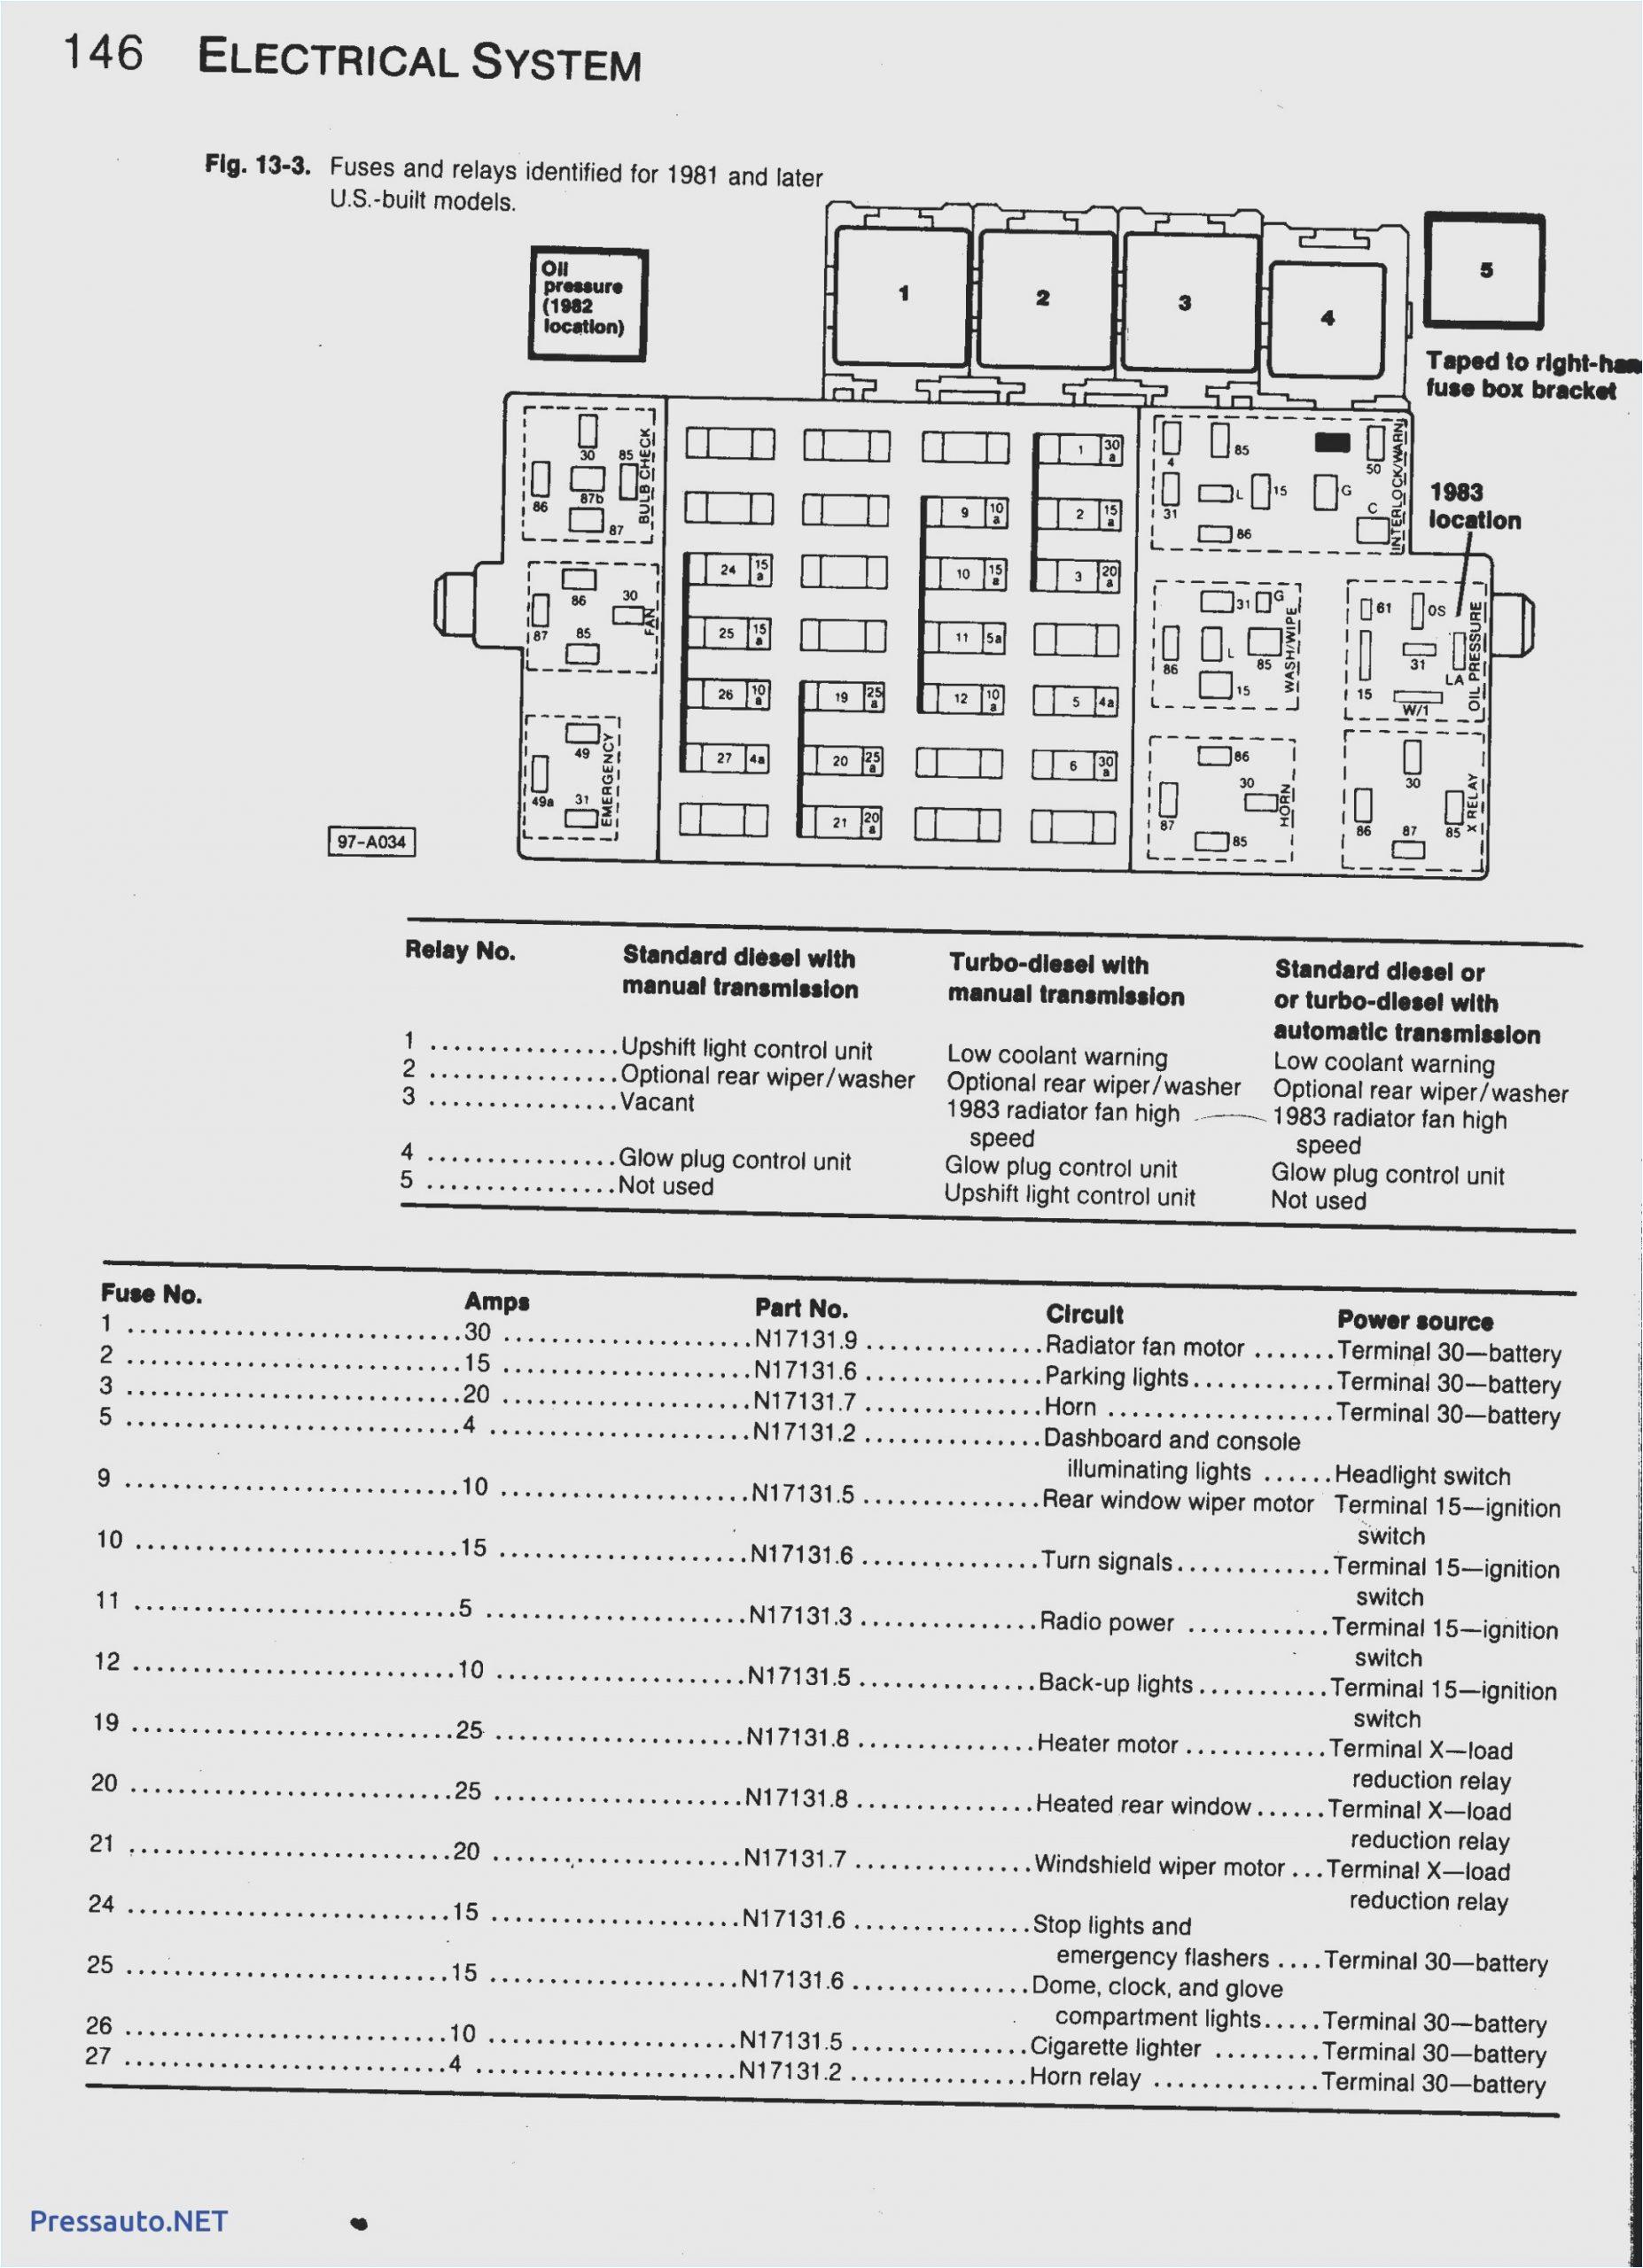 2003 Volkswagen Beetle Wiring Diagram 00 Vw Jetta Fuse Panel Diagram Lupa Repeat24 Klictravel Nl